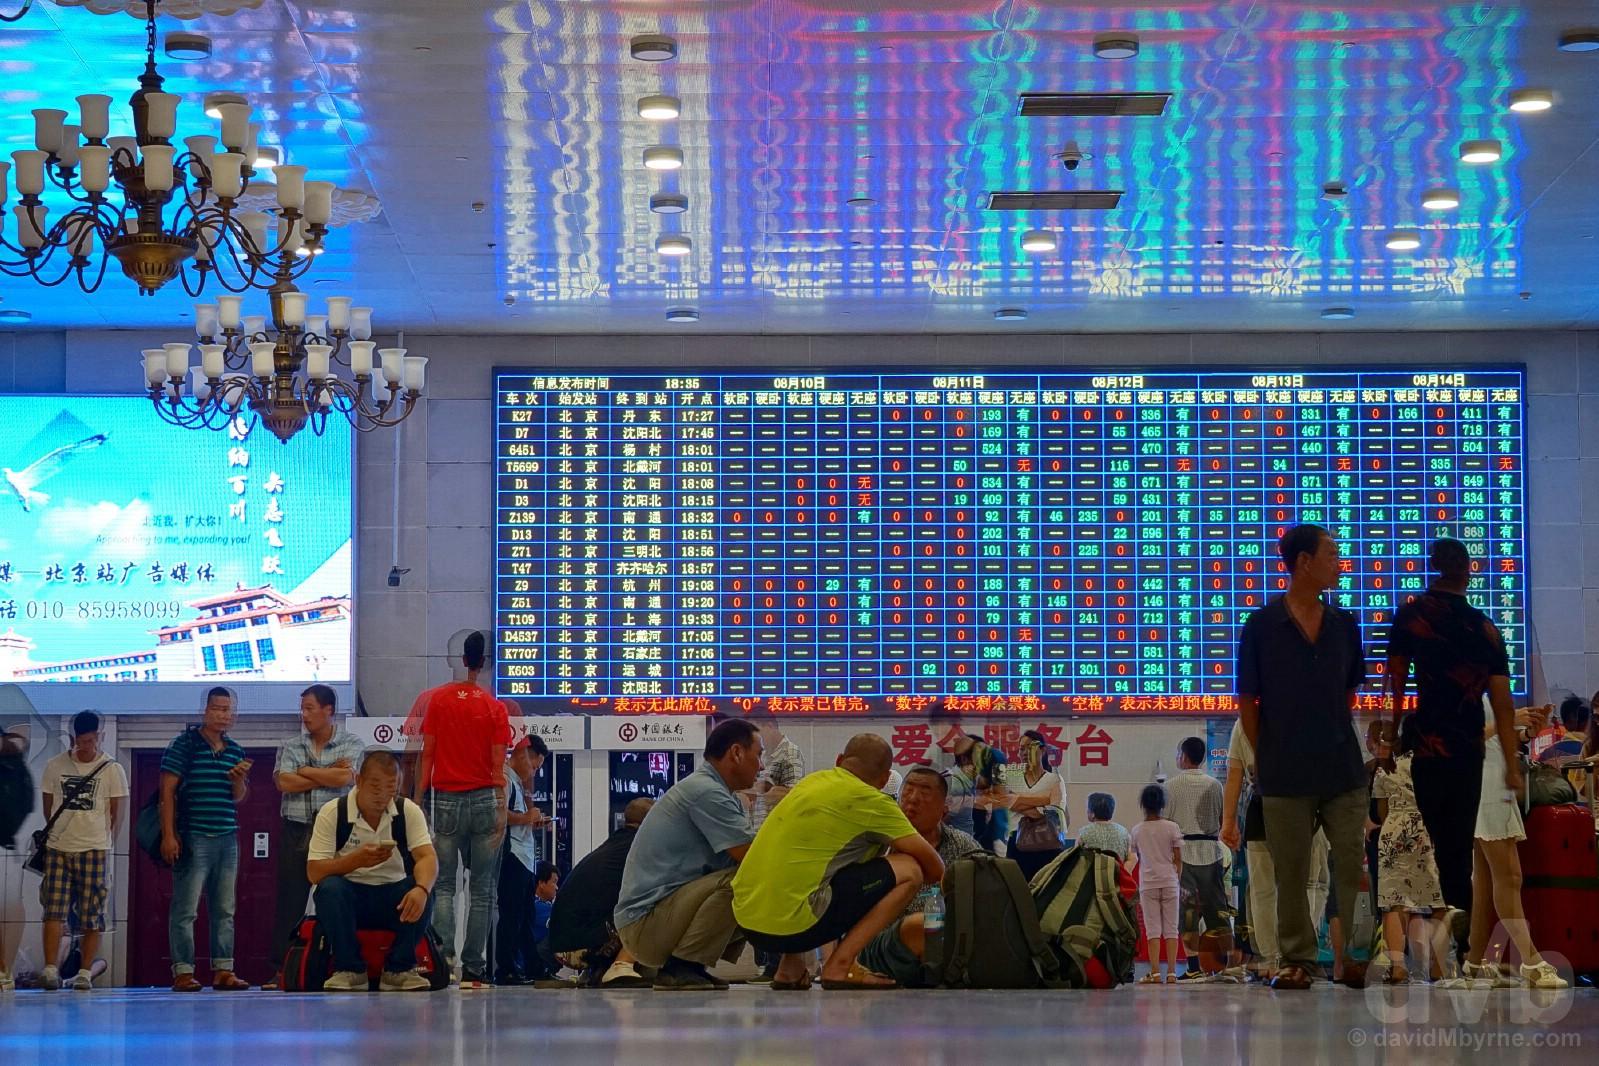 Ticket office, Beijing Railway Station, Beijing, China. August 10, 2017.